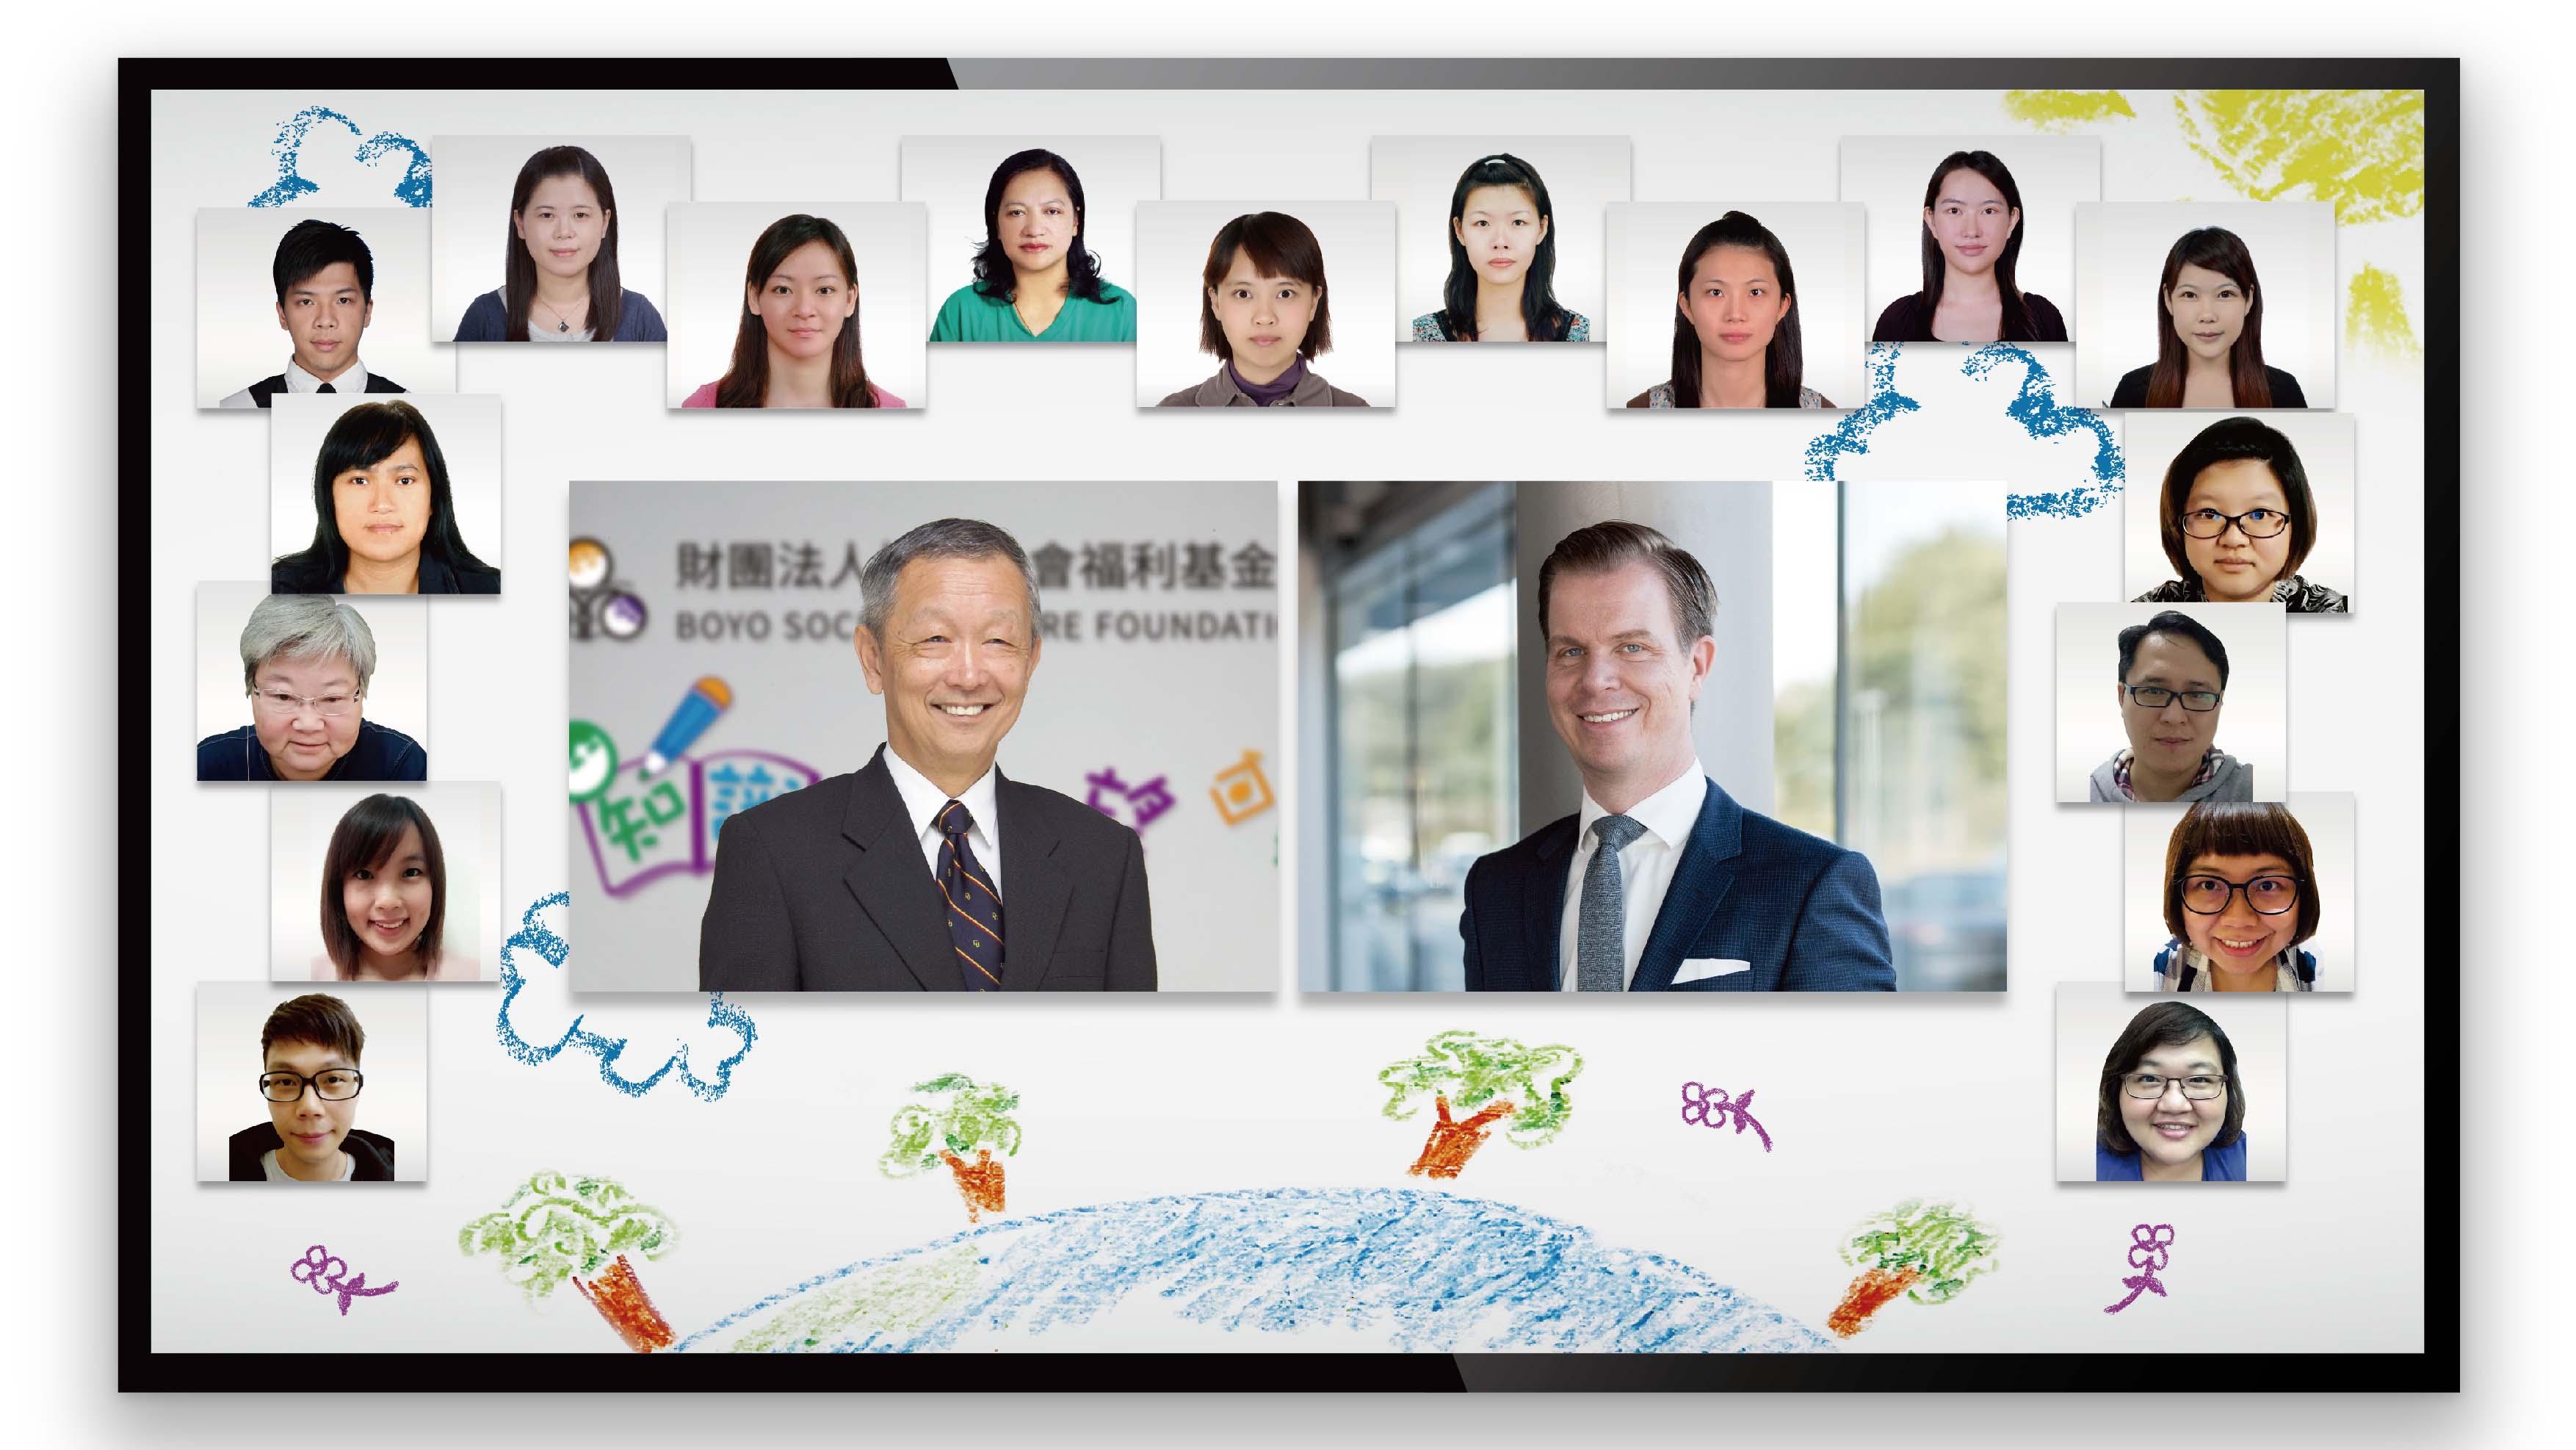 Porsche Taiwan 與經銷商捐贈 135 萬予博幼基金會